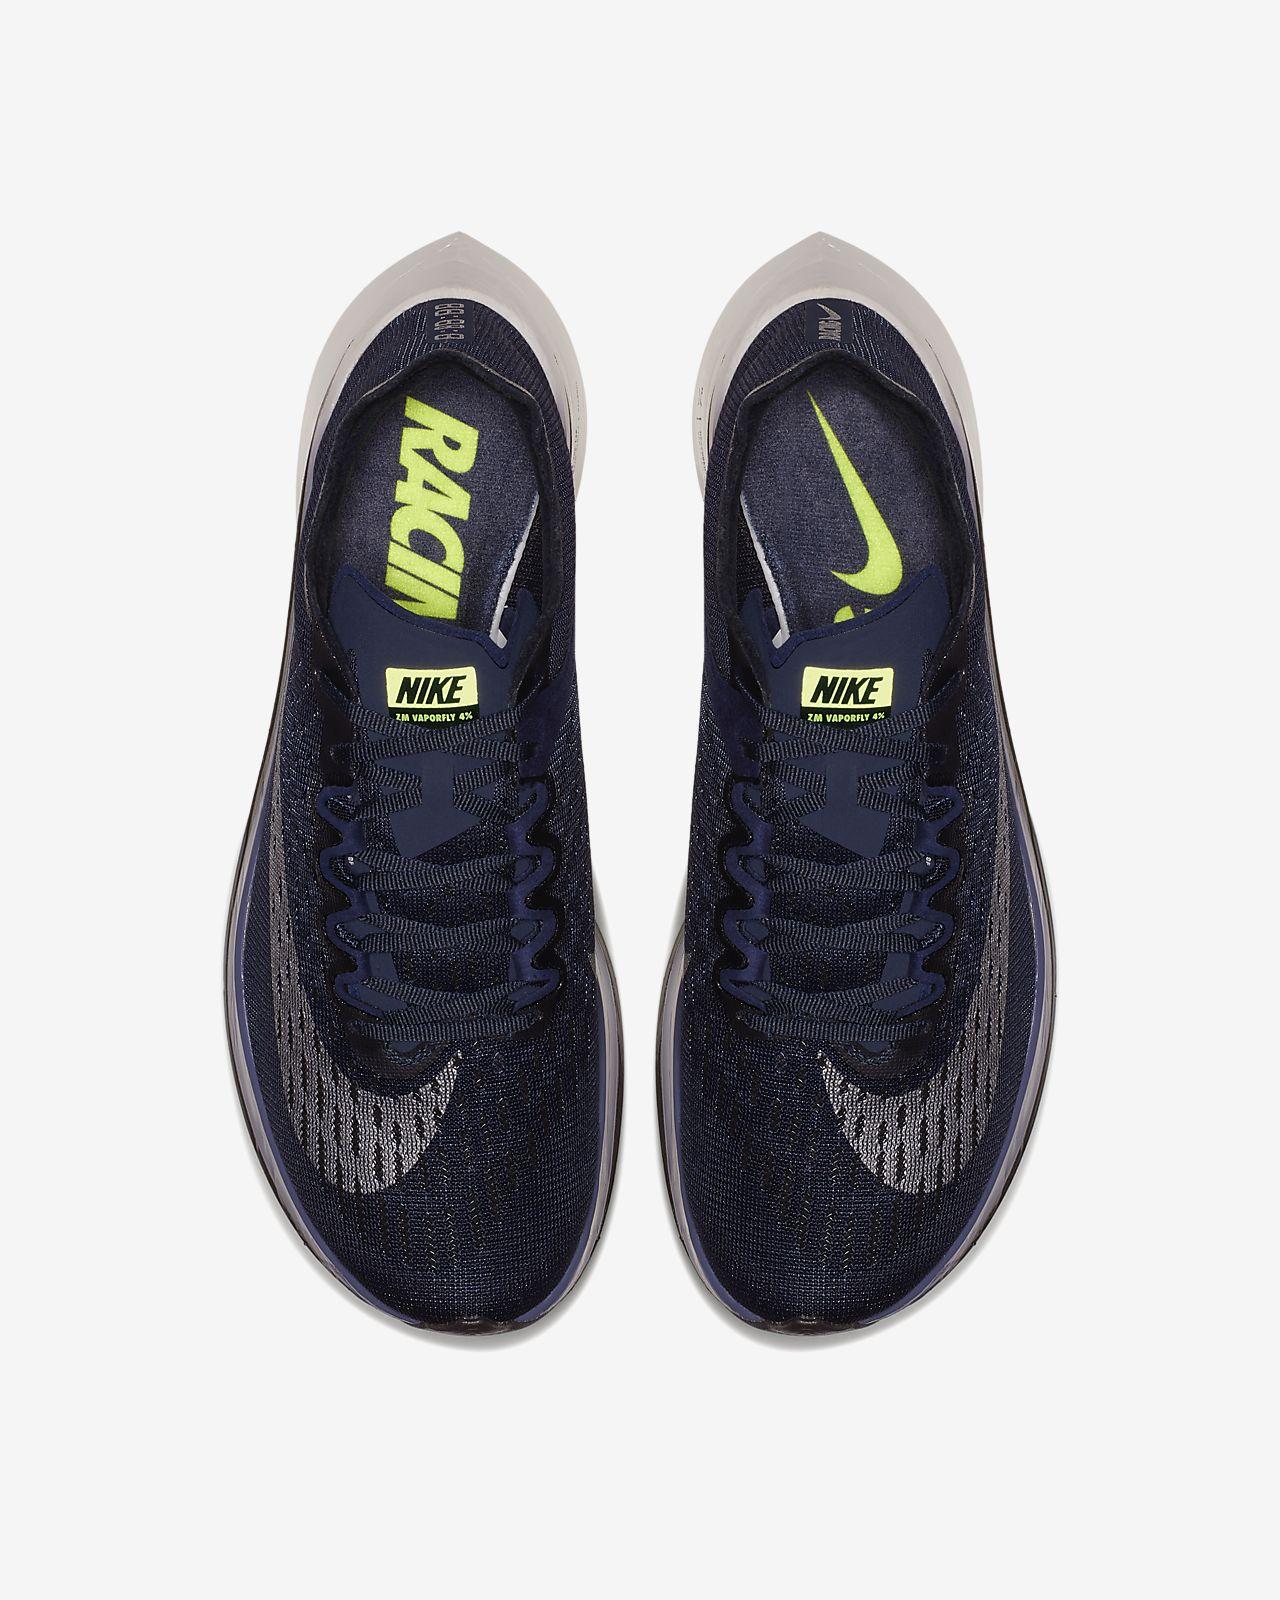 chaussure de running mixte nike zoom vaporfly 4 fr. Black Bedroom Furniture Sets. Home Design Ideas